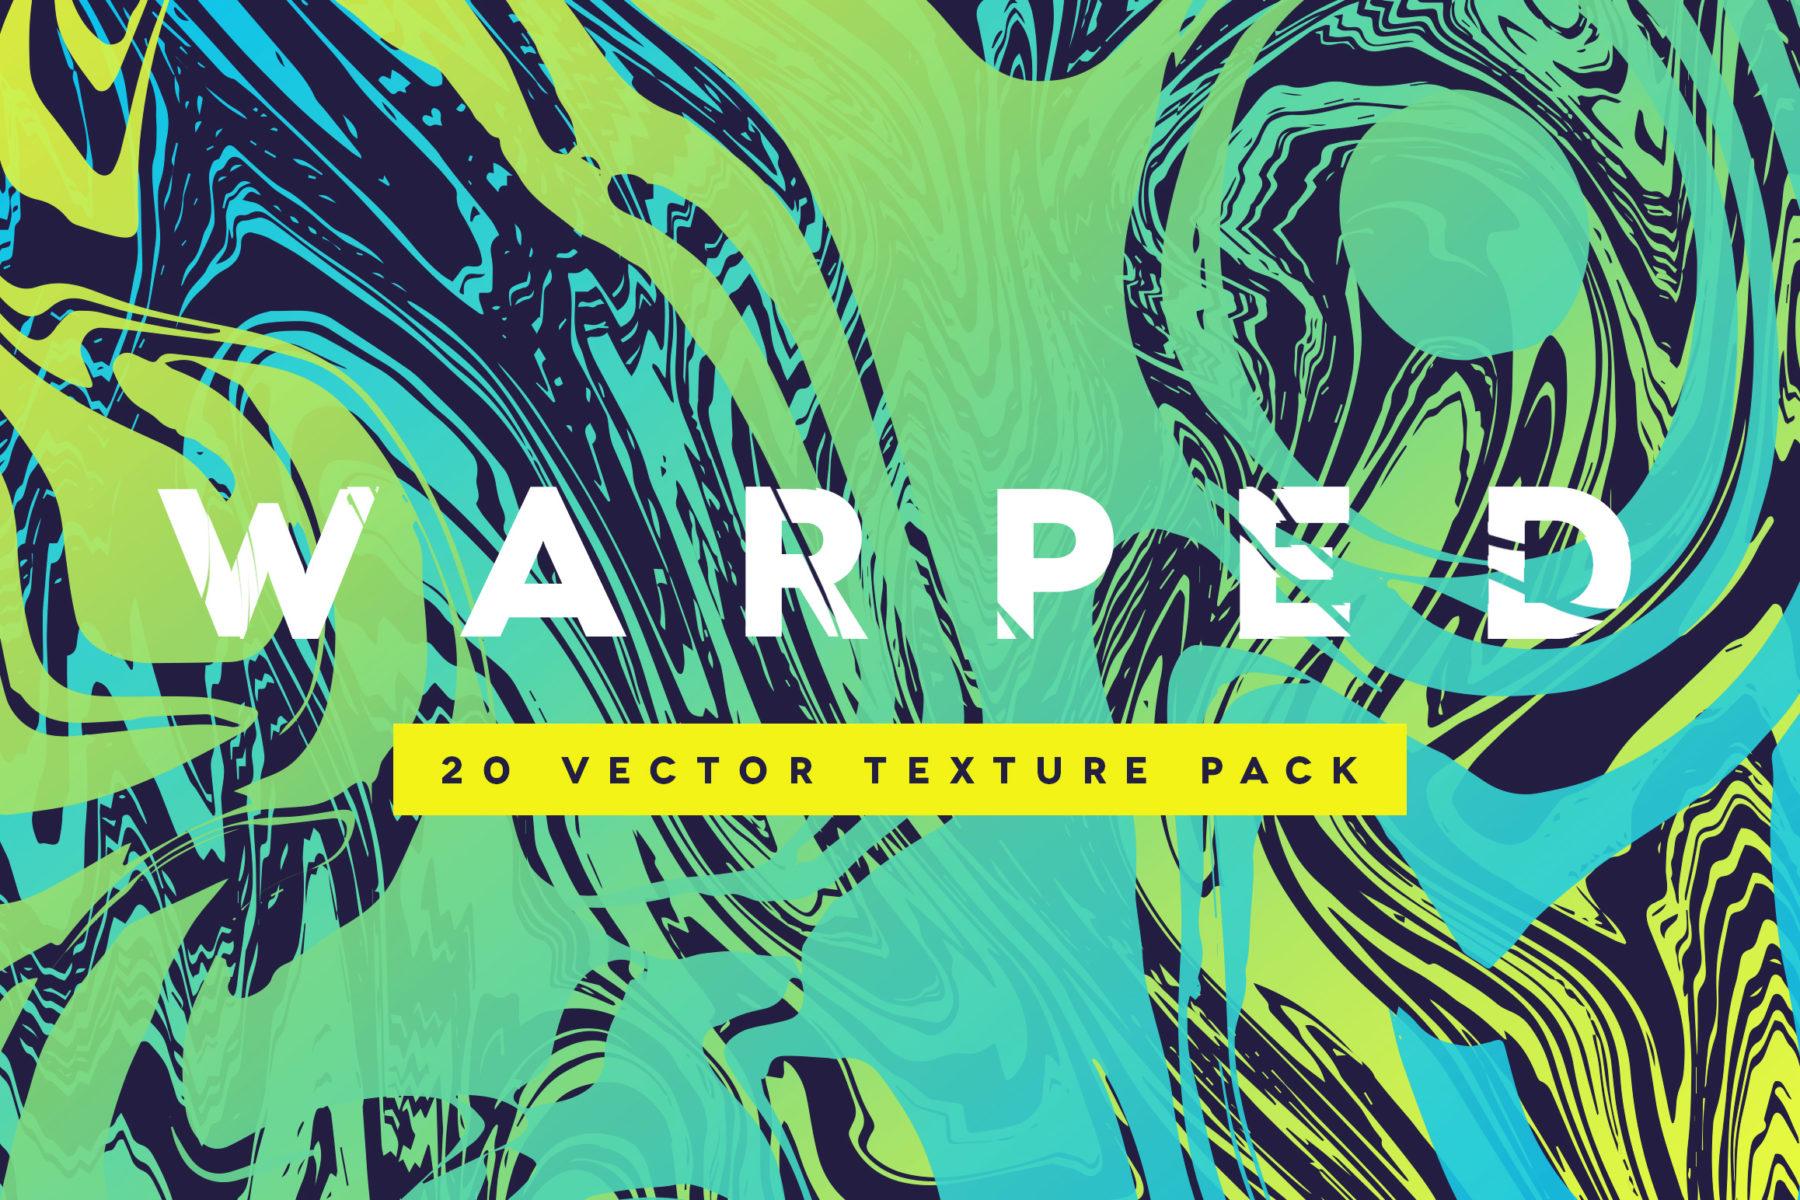 https://nusupply.co/wp-content/uploads/2020/03/warped-vector-texture-pack-1800x1200.jpg